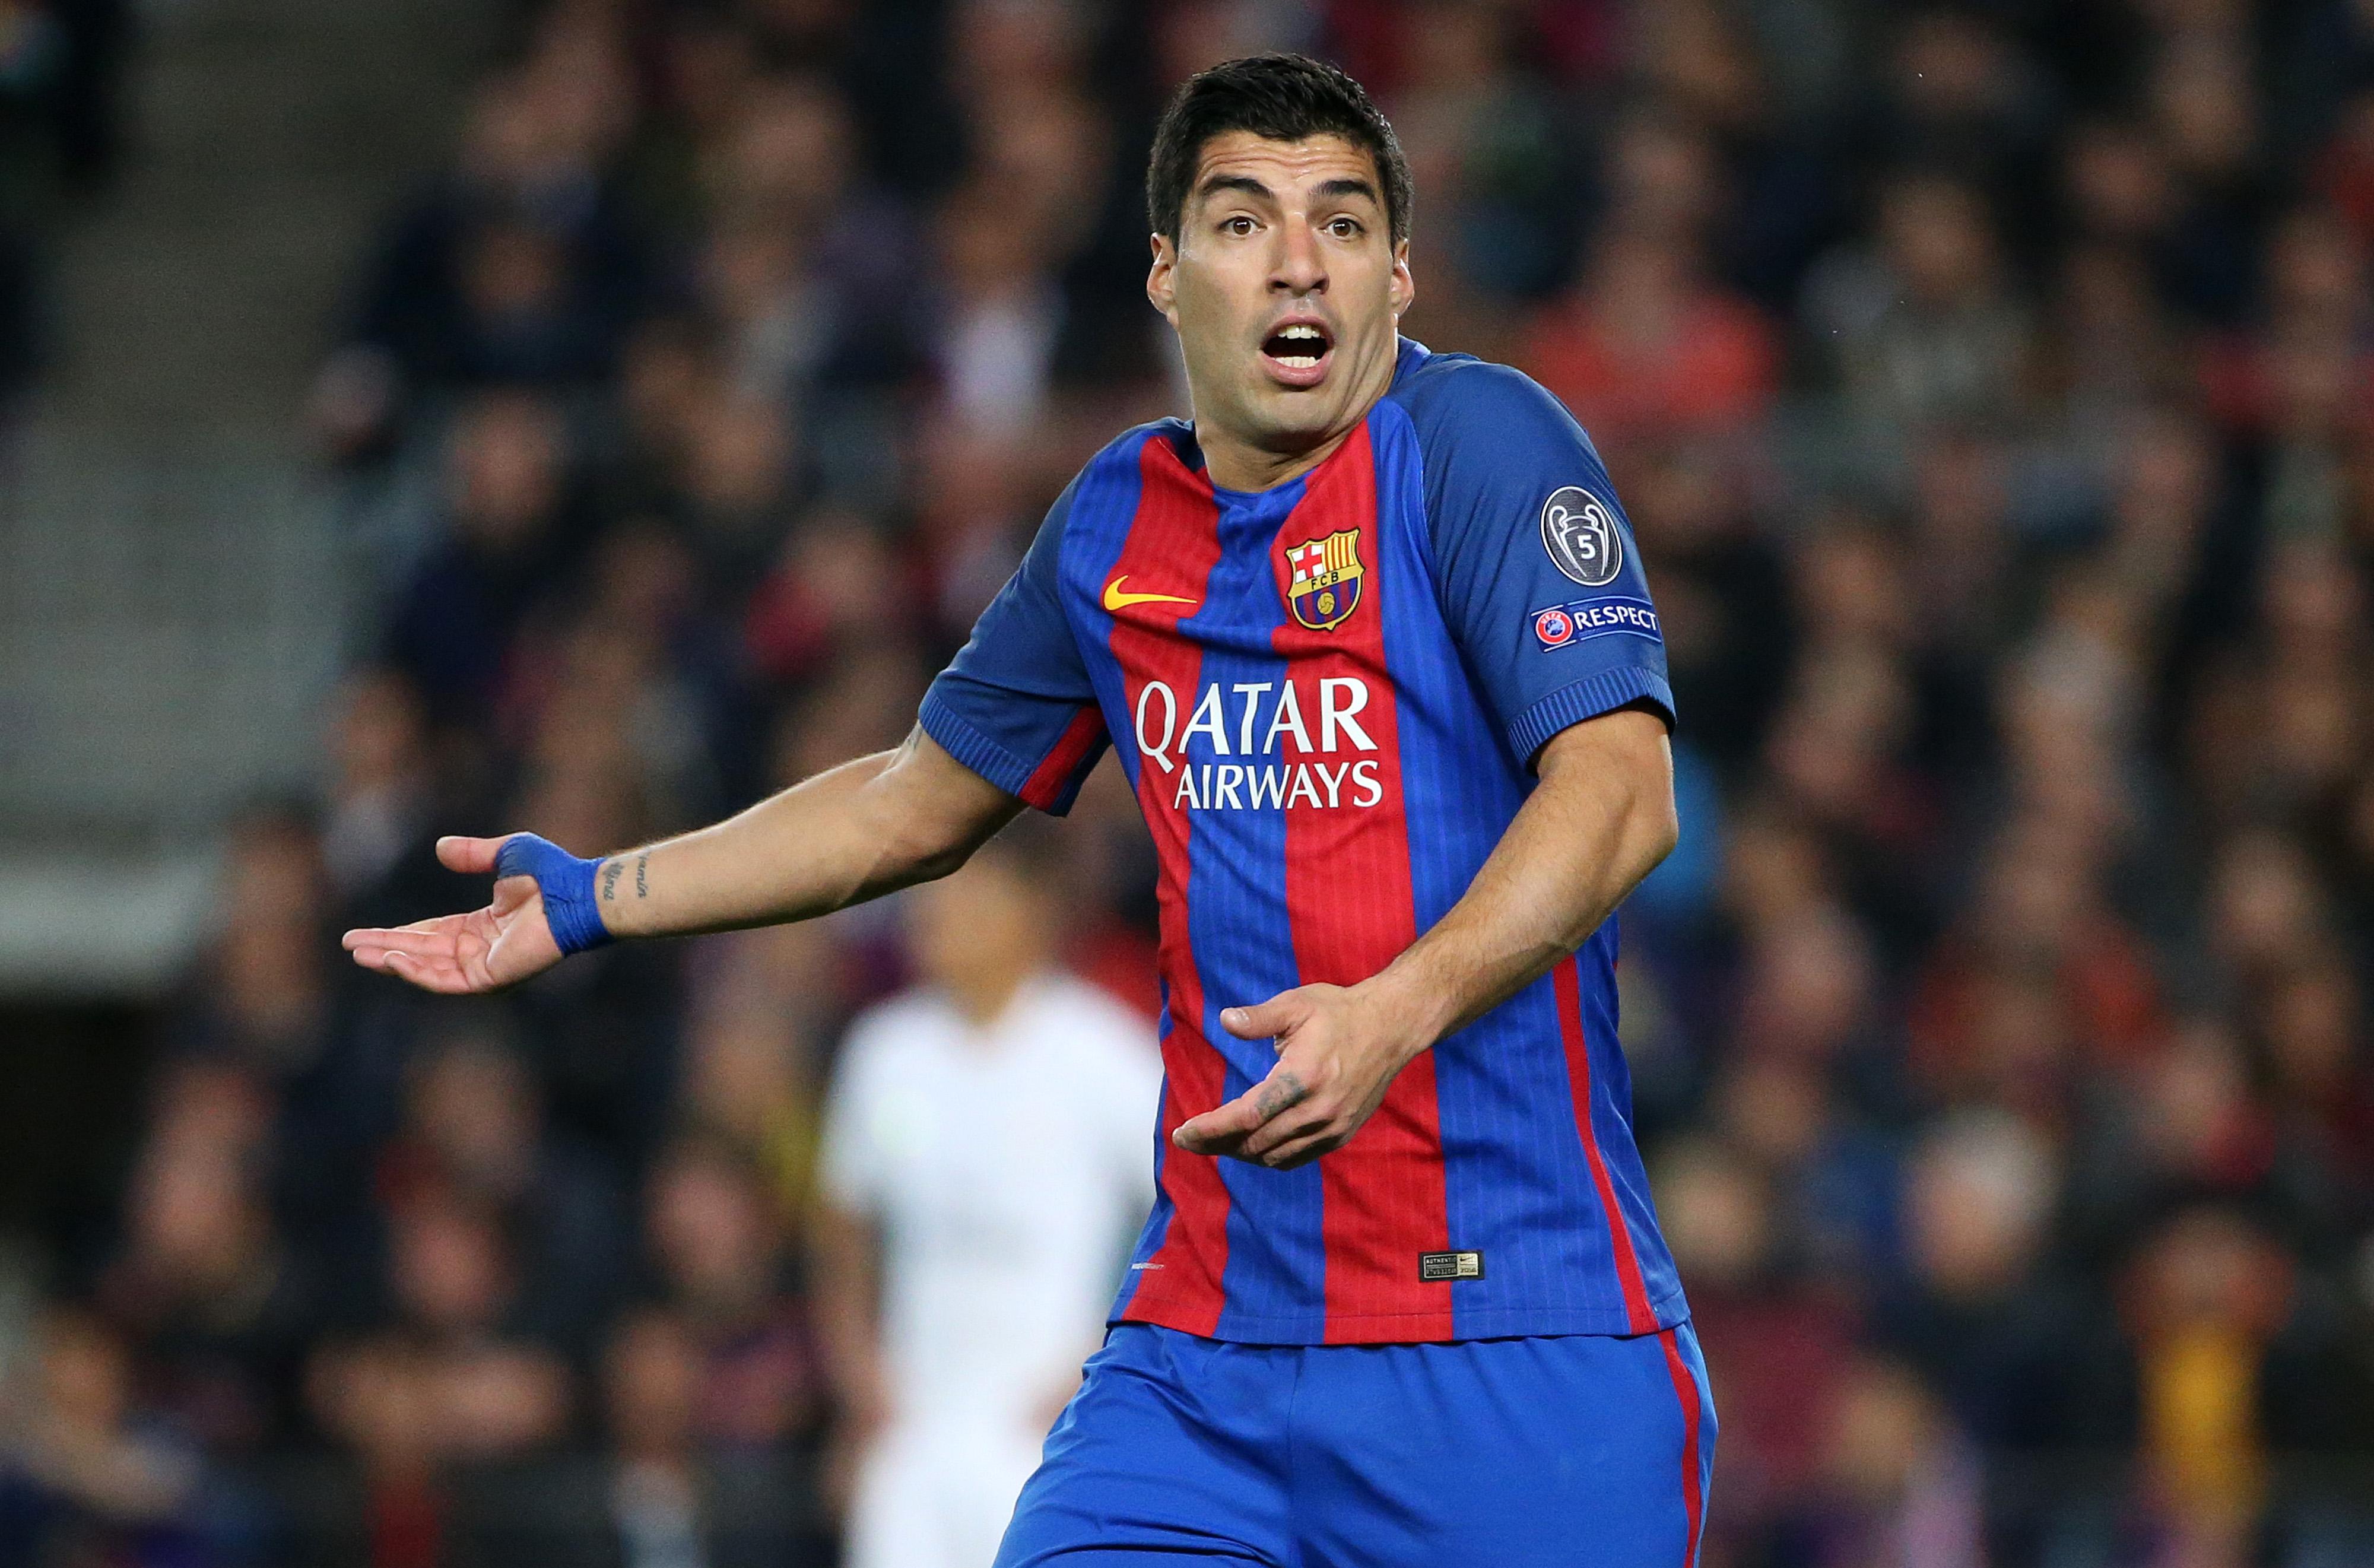 Luis Suarez slammed by Thiago Silva after Barcelona's historic Champions League win over PSG